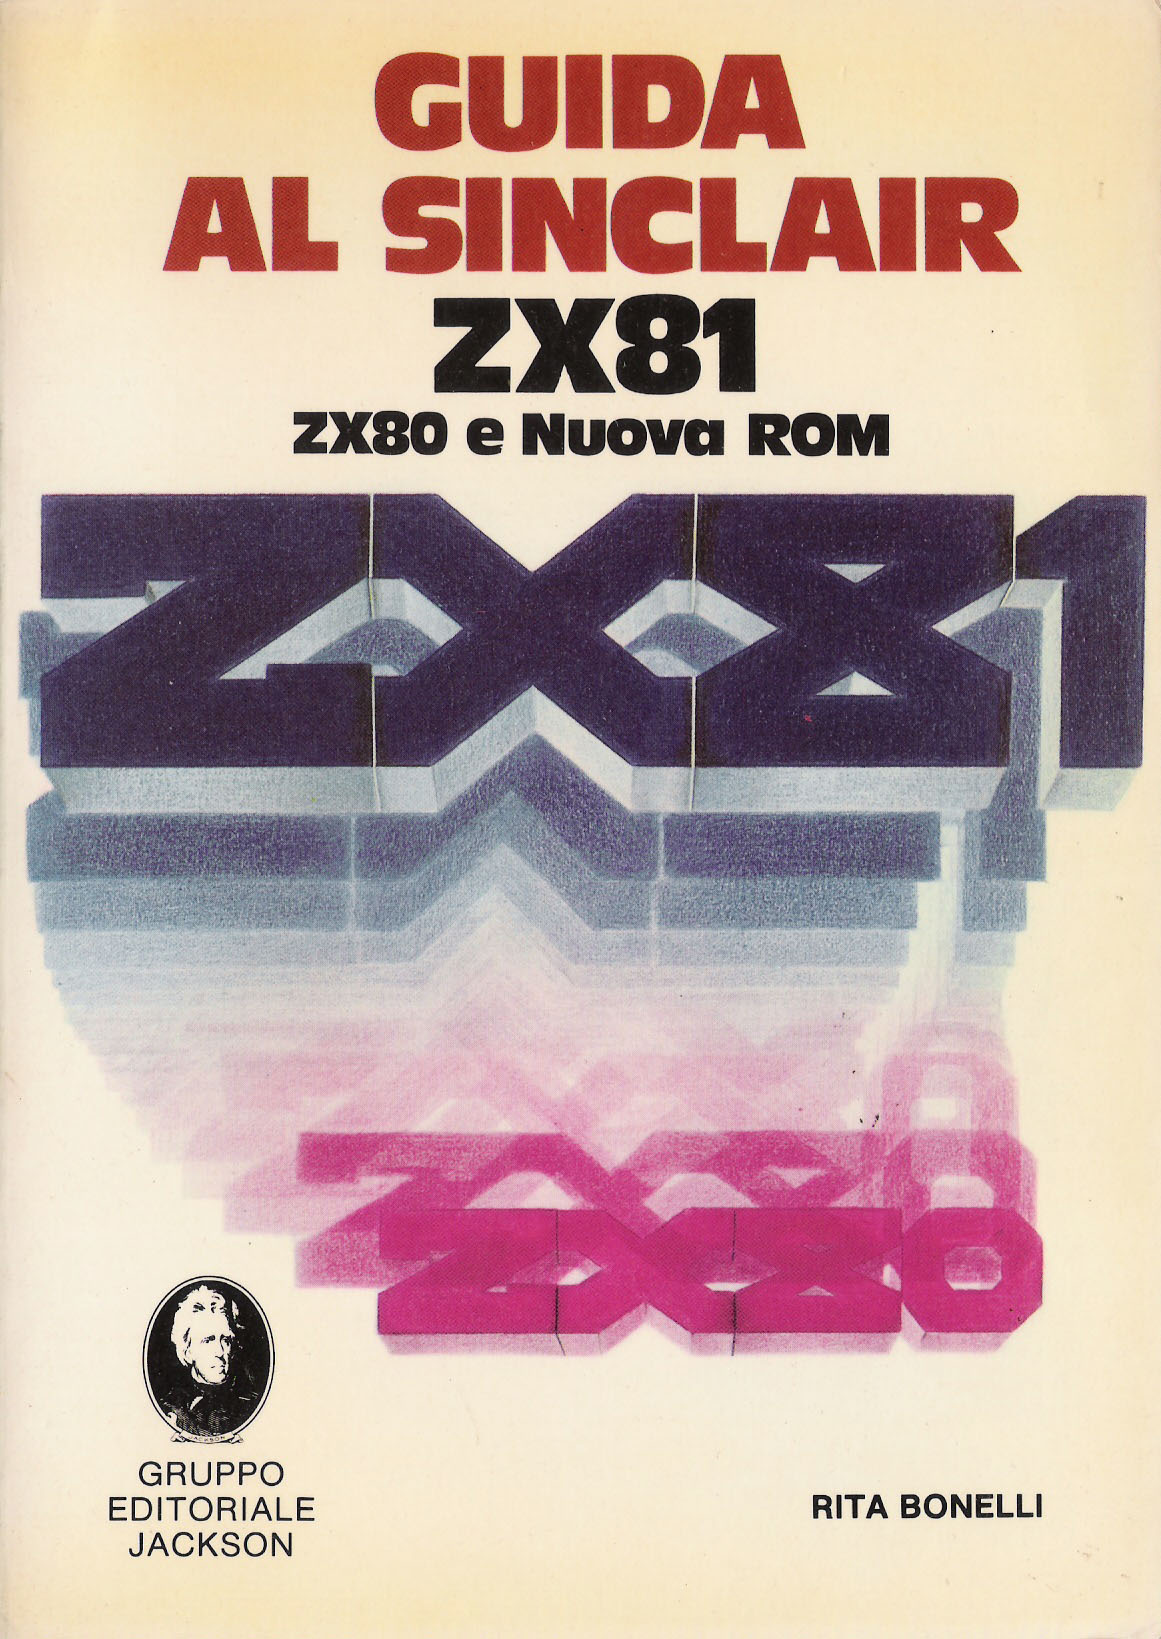 Guida al Sinclair ZX81 ZX80 e Nuova ROM image, screenshot or loading screen